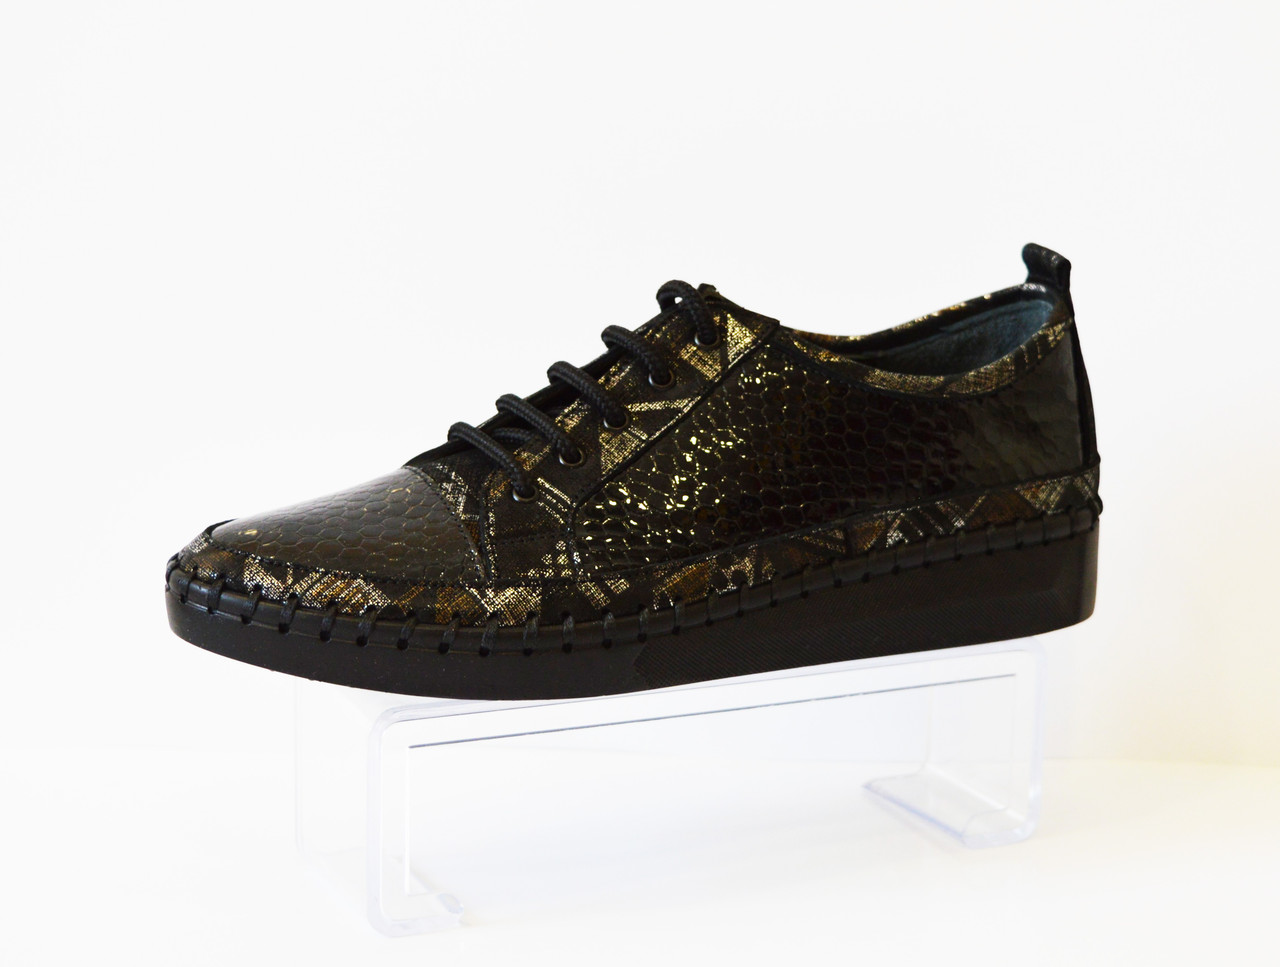 Туфли на шнурке женские Ripka 300 36 размер